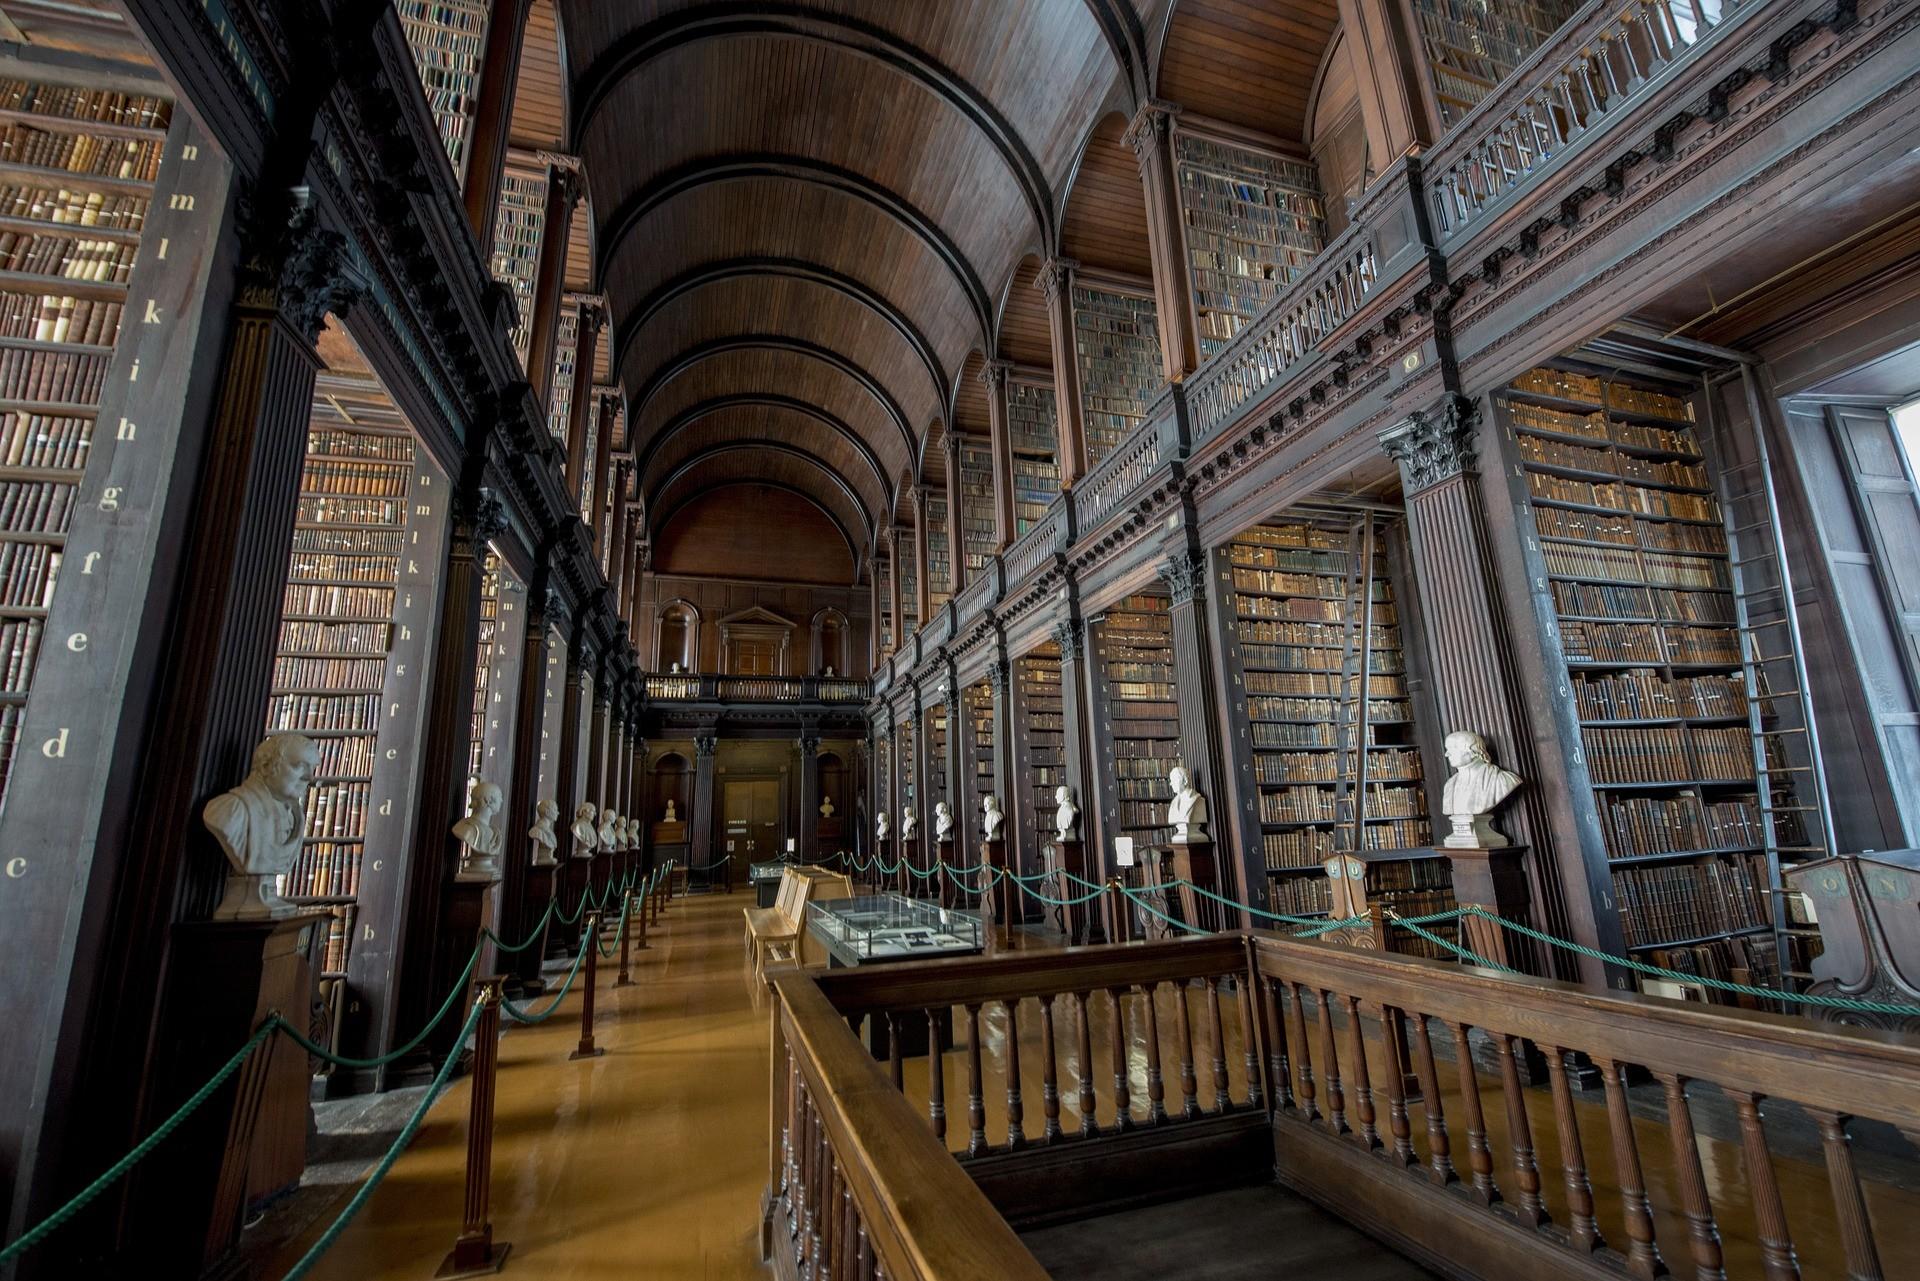 Trinity College, Dublino - Foto di Albert van den Boomen